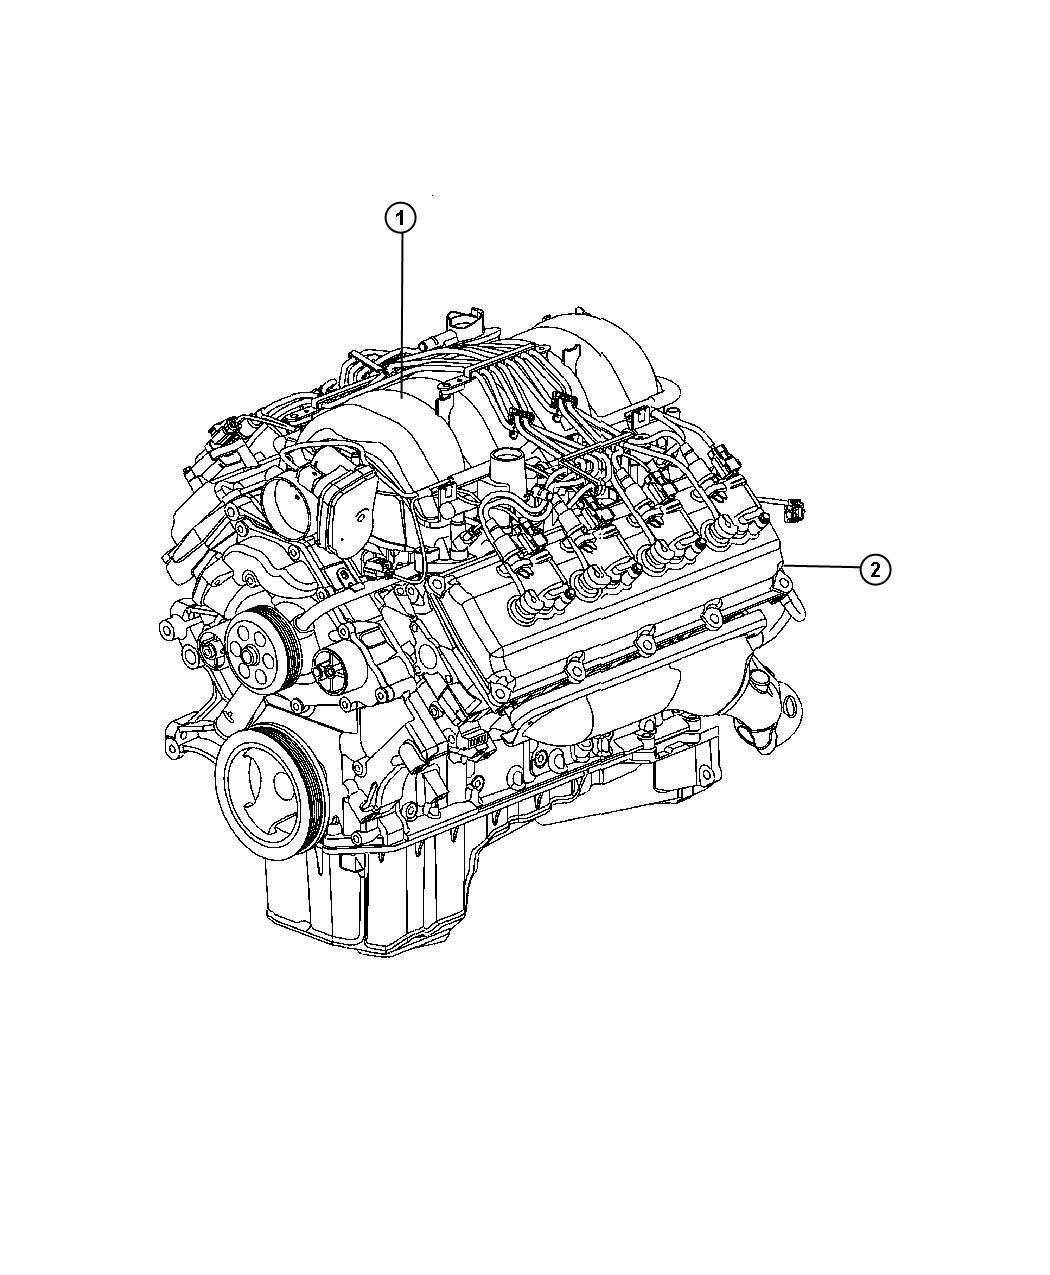 Dodge Challenger Engine Long Block Remanufactured